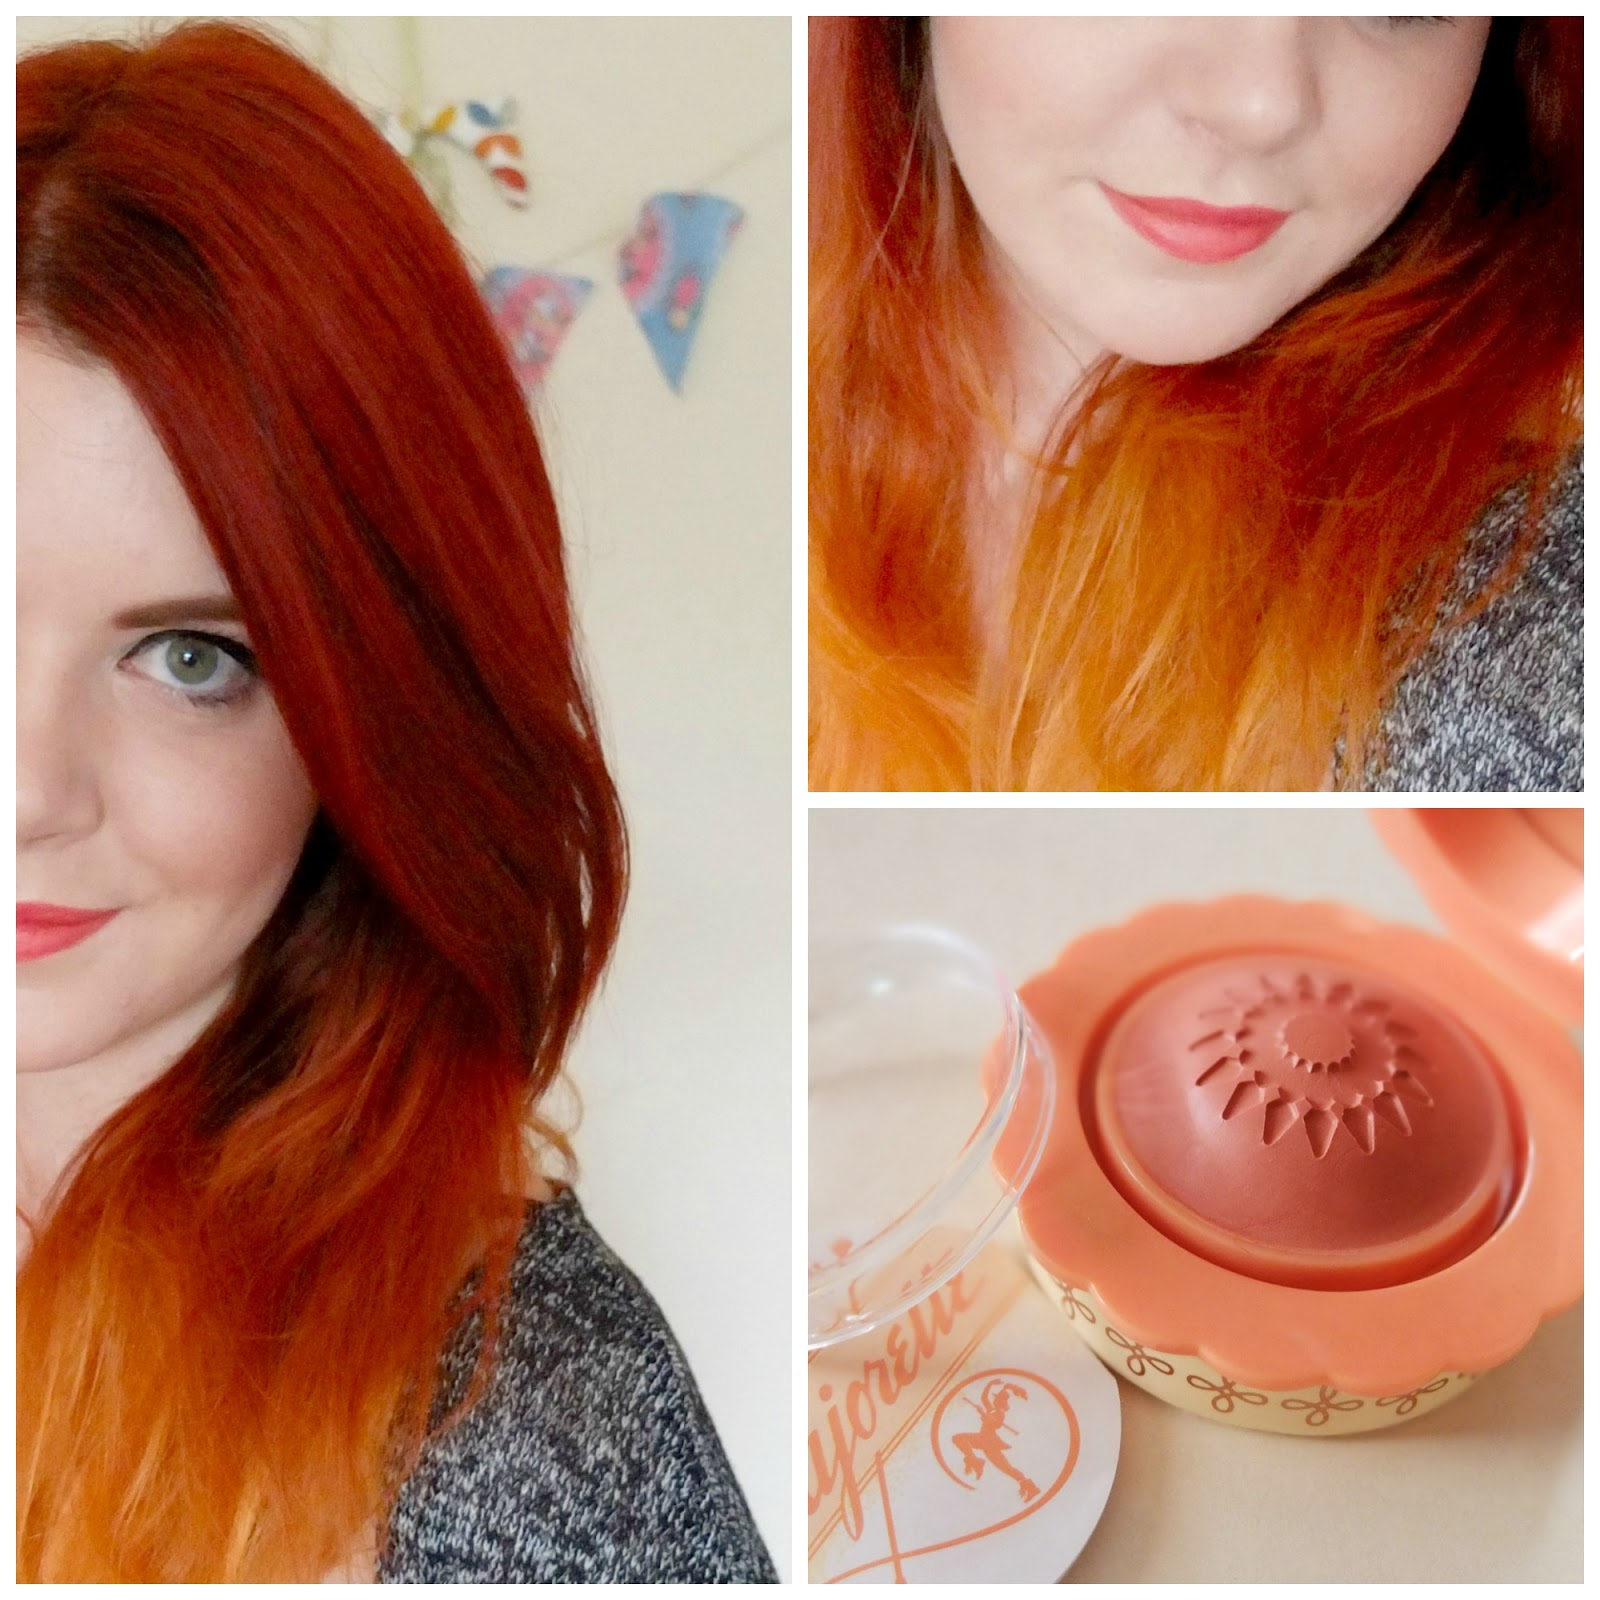 Benefit Cosmetics New Release: Majorette Cream Blush Blog Review